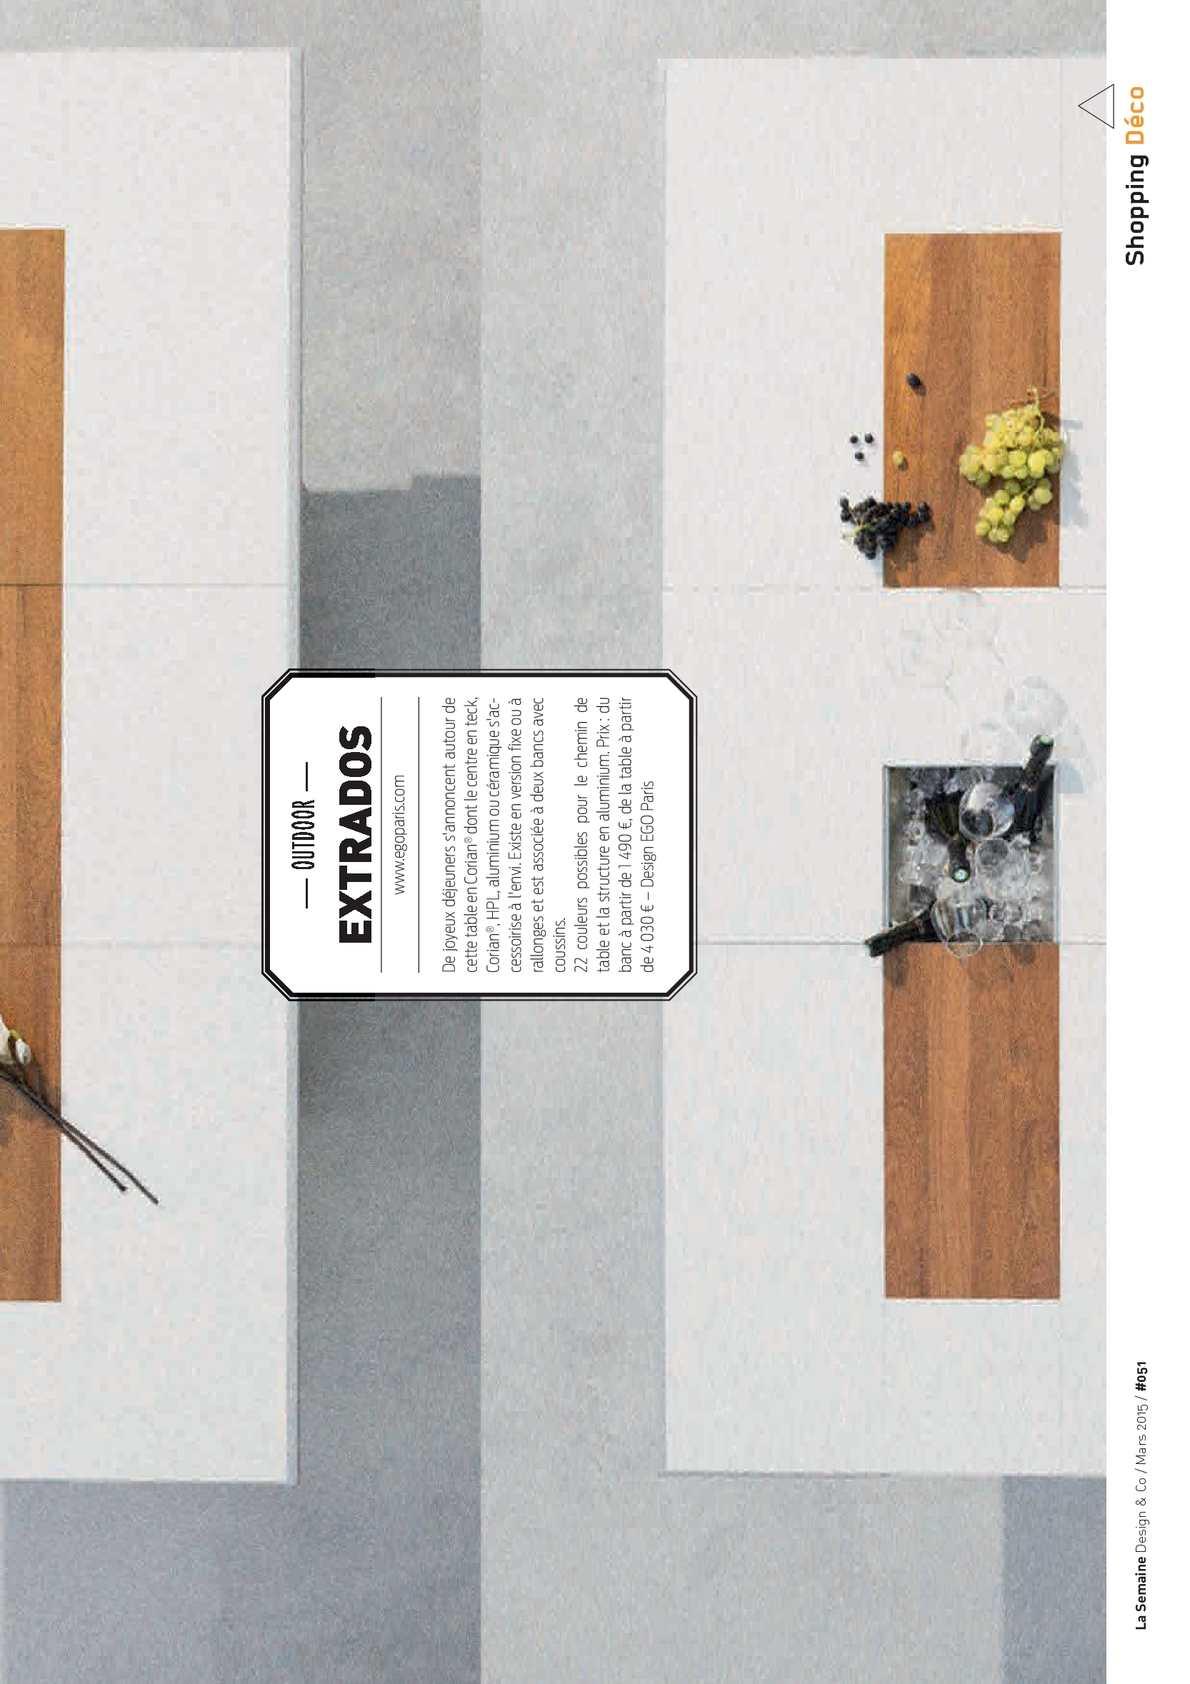 Prix Corian Au M2 supplément design 2015 - la semaine - calameo downloader